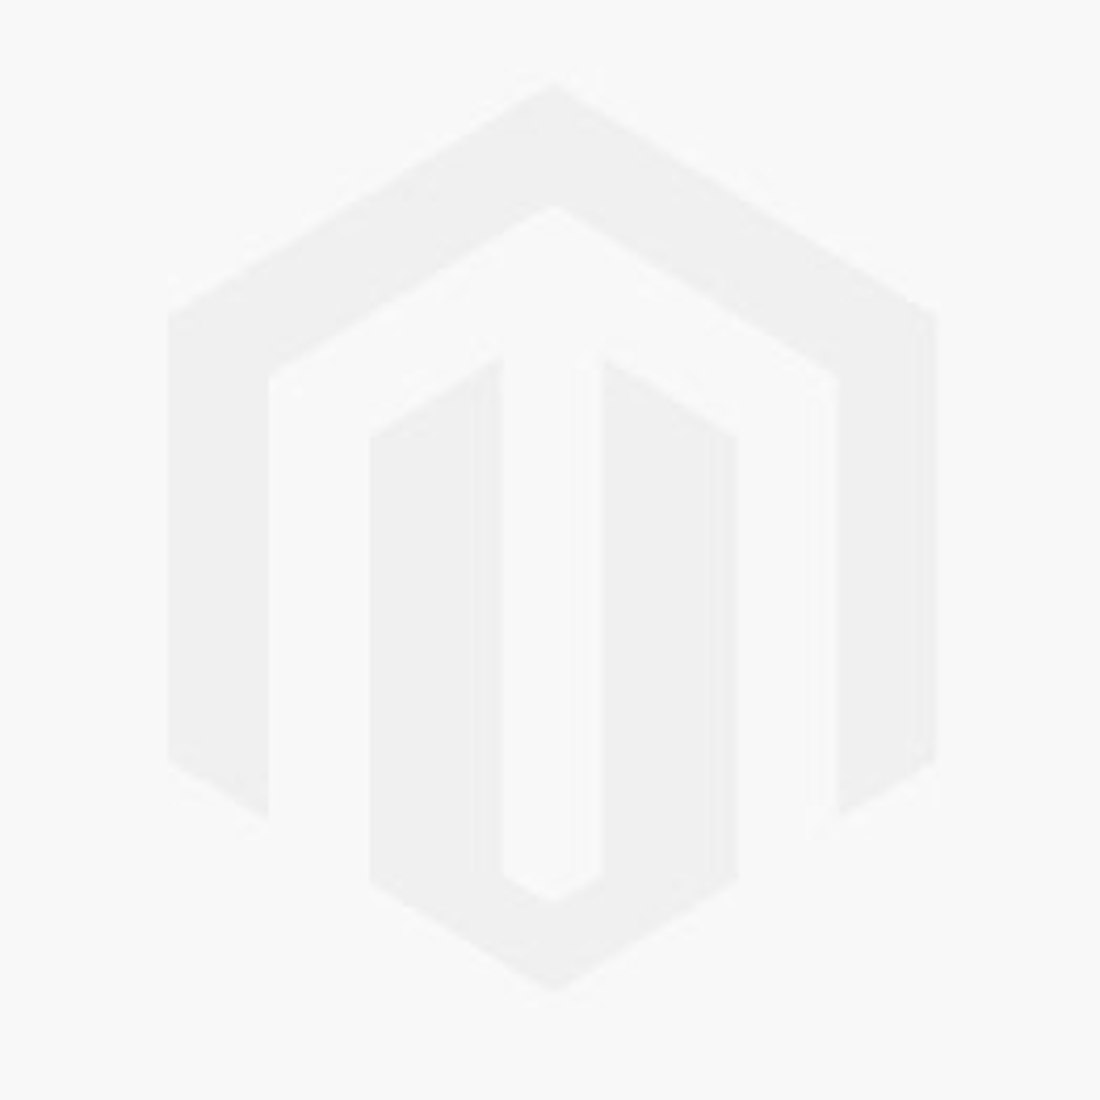 Eco-Visionaries exhibition catalogue cover